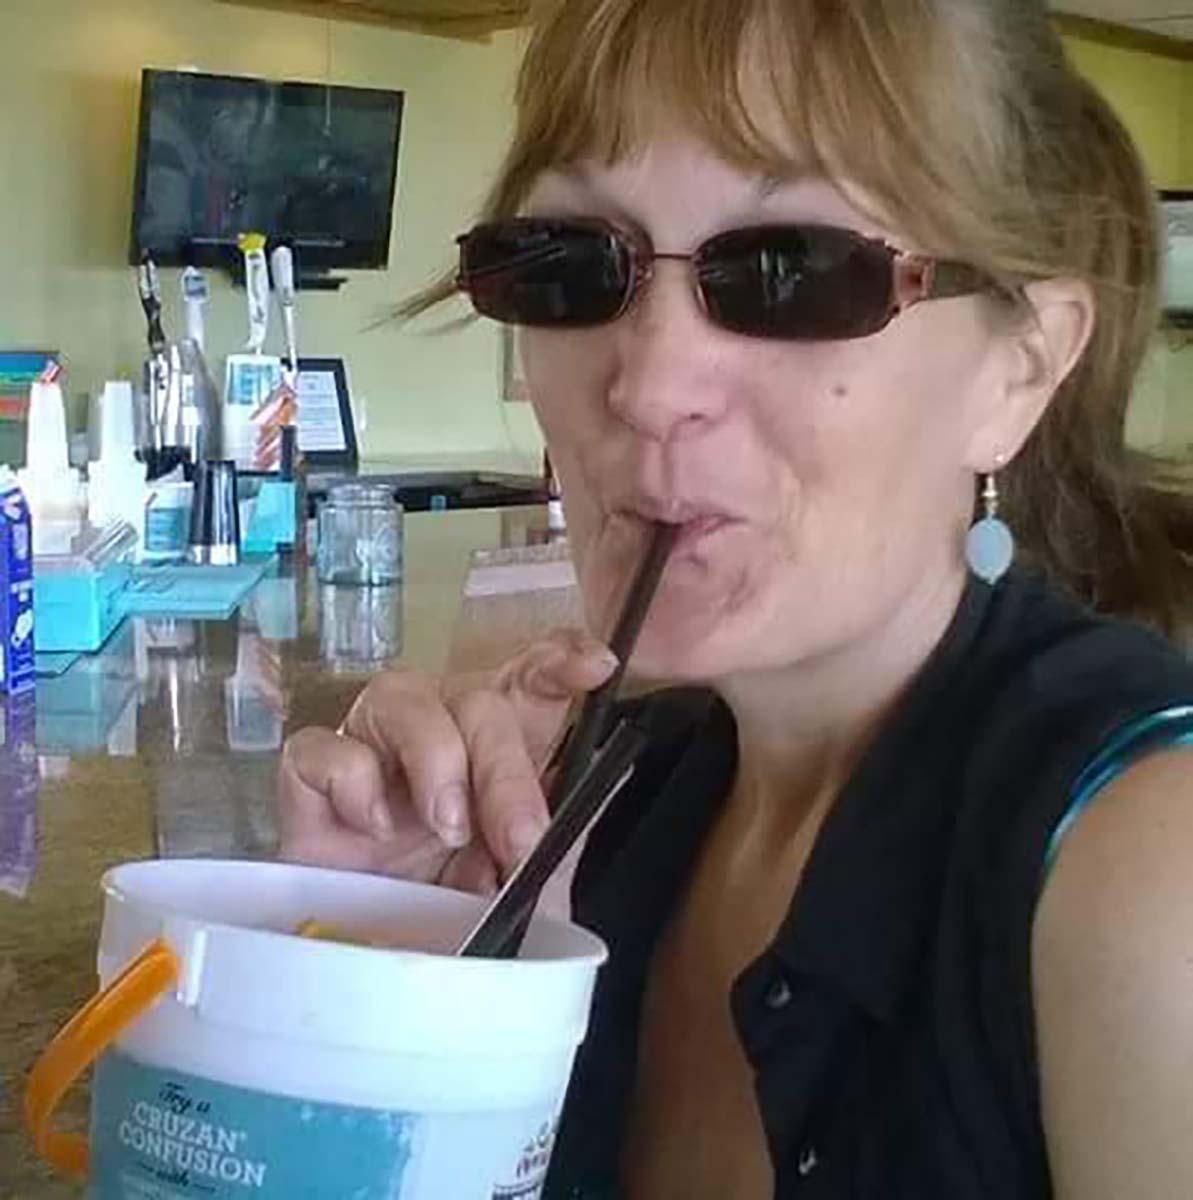 Lady drinking voodoo bucket at the bar